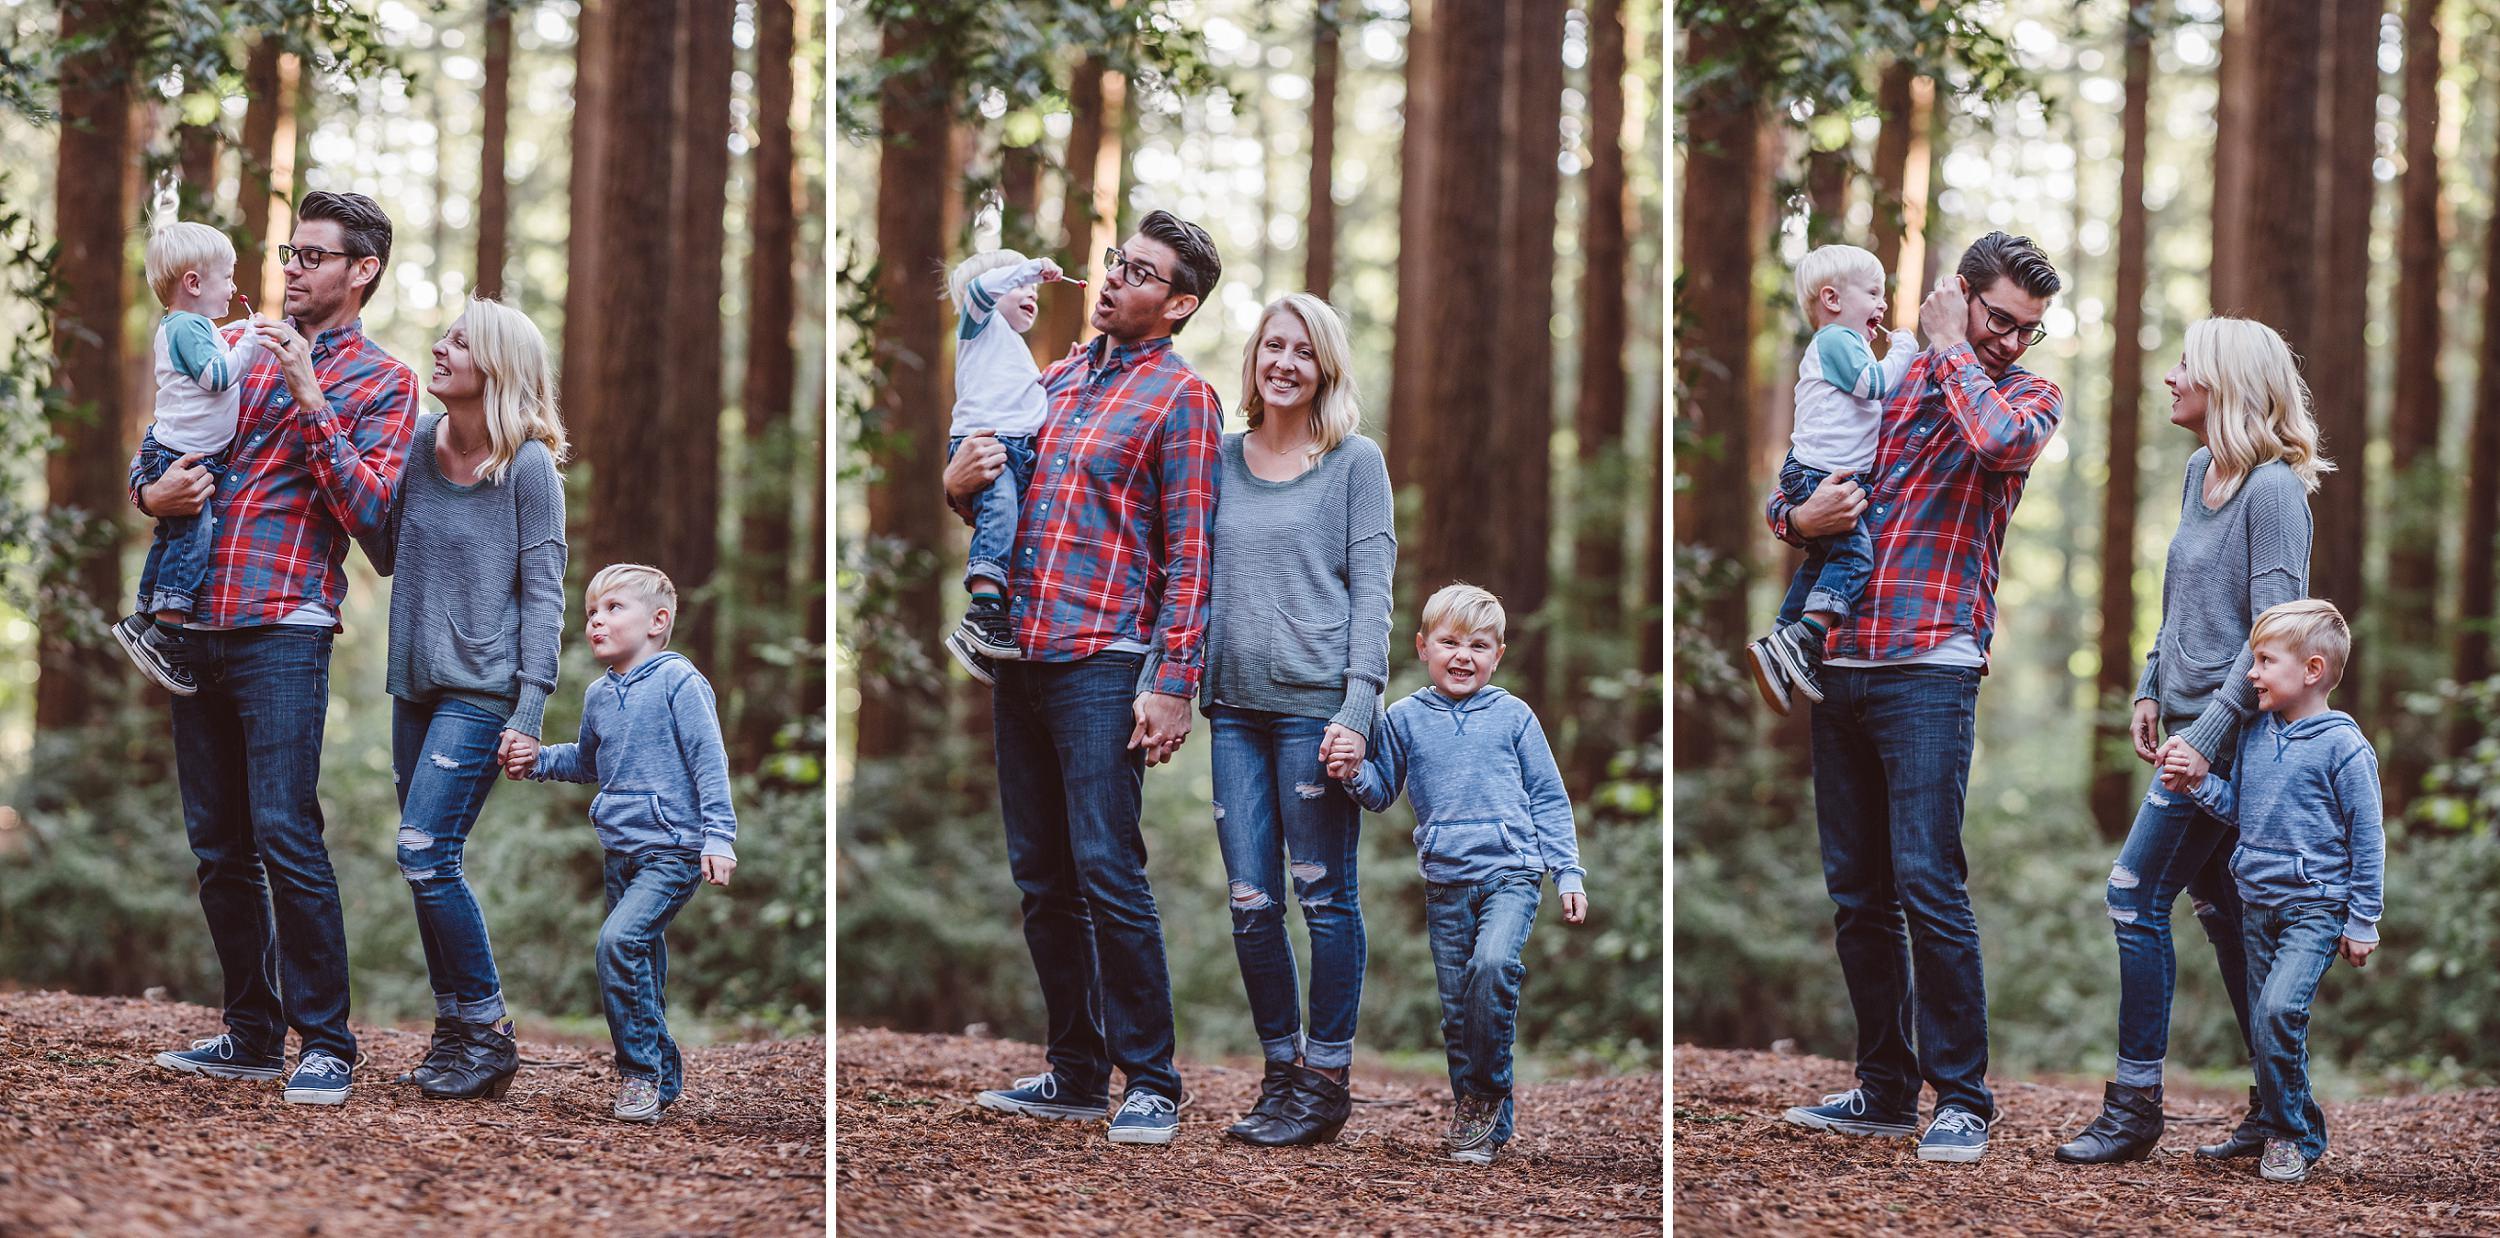 Joaquin-Miller-Park-Oakland-Family-Photography-009.jpg